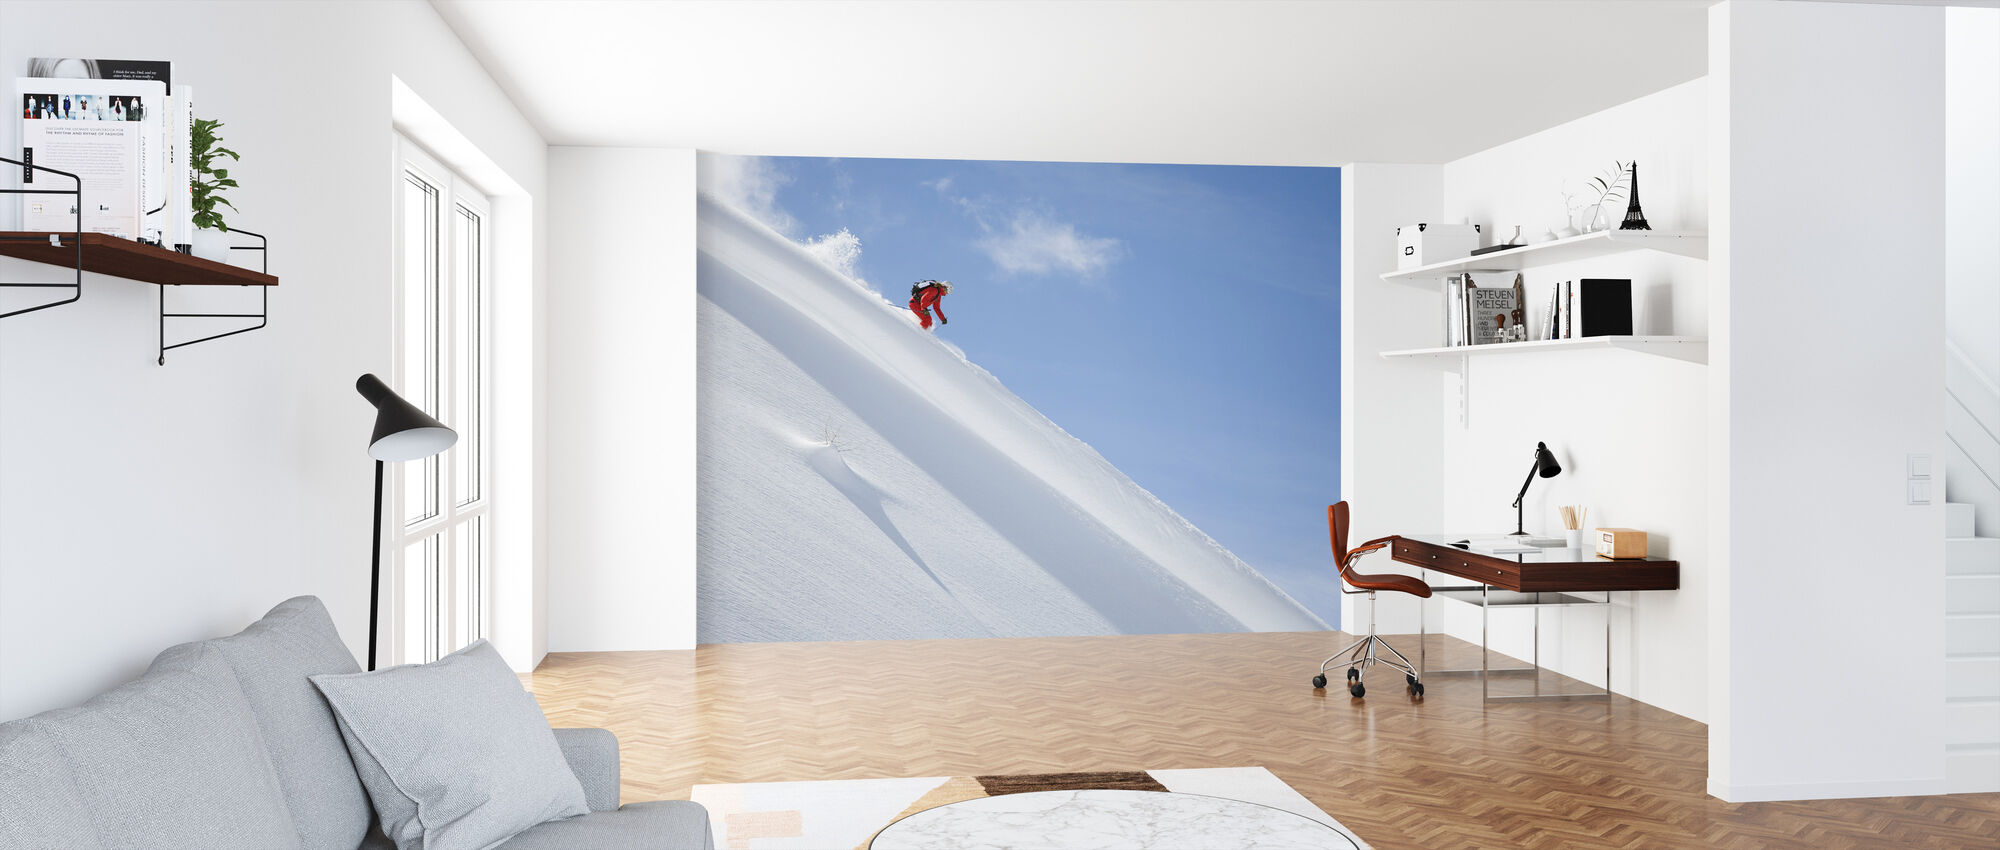 Off Piste Skiing - Wallpaper - Office